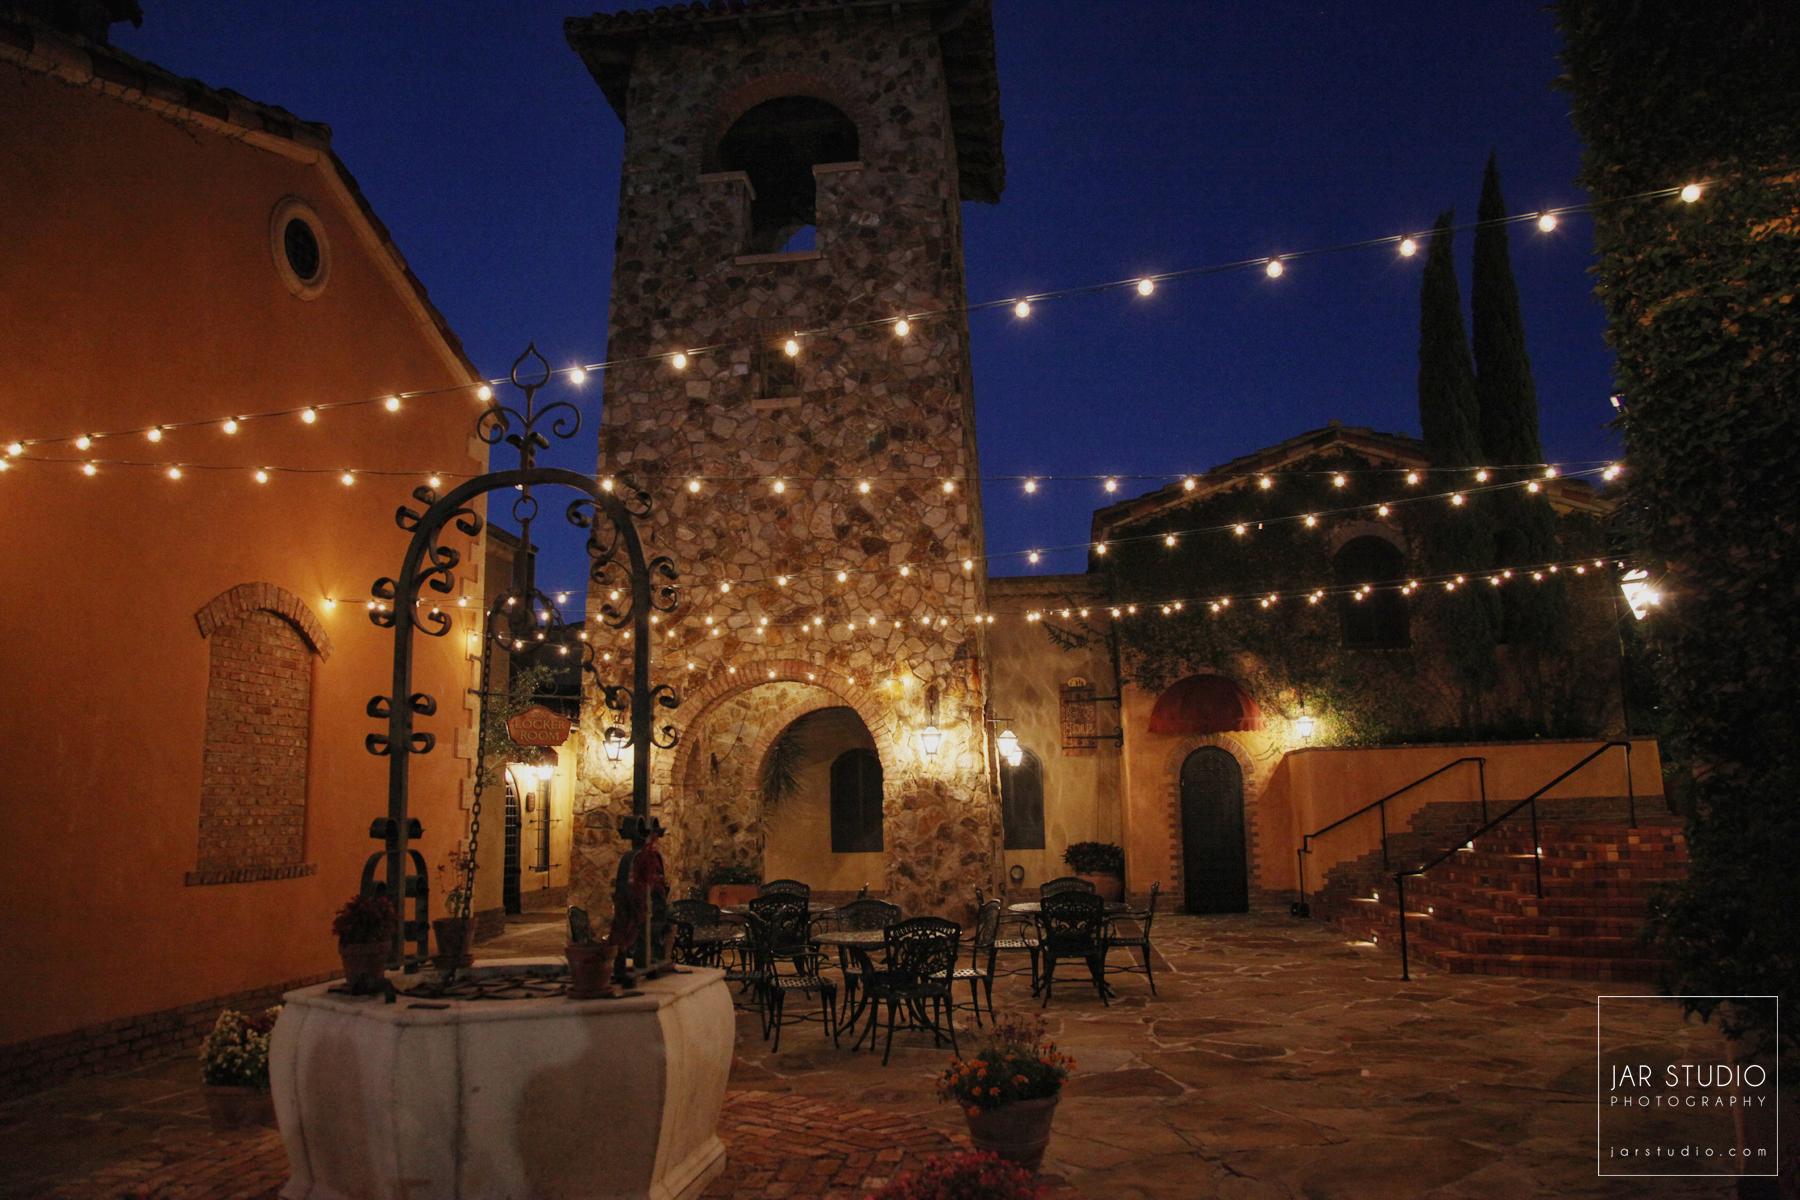 25-the-stunning-tuscan-bella-collina-jarstudio-orlando-photography.jpg